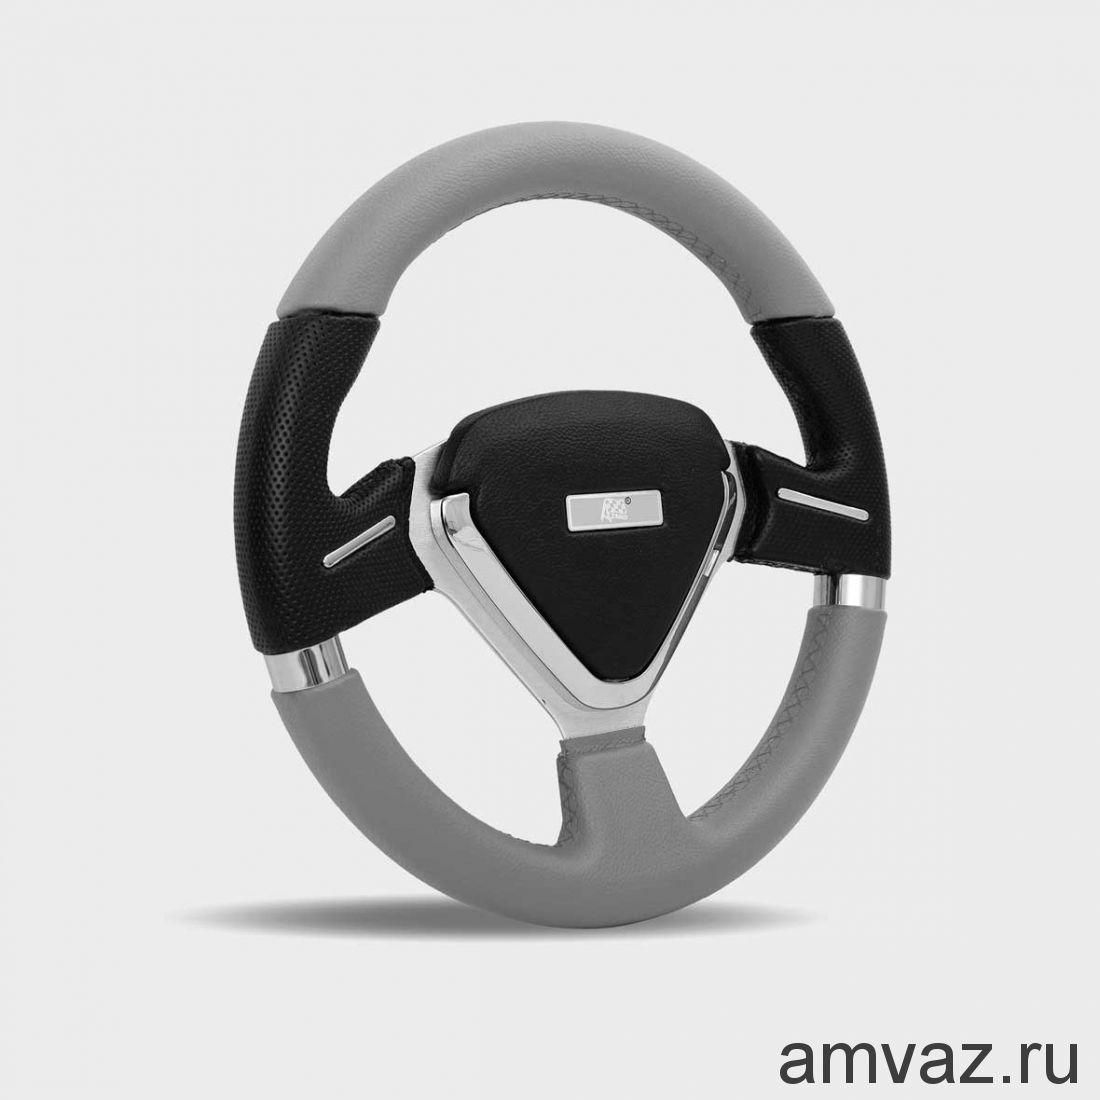 Руль спортивный Azard арт.4163 СЕРДЦЕ /СЕРЫЙ/